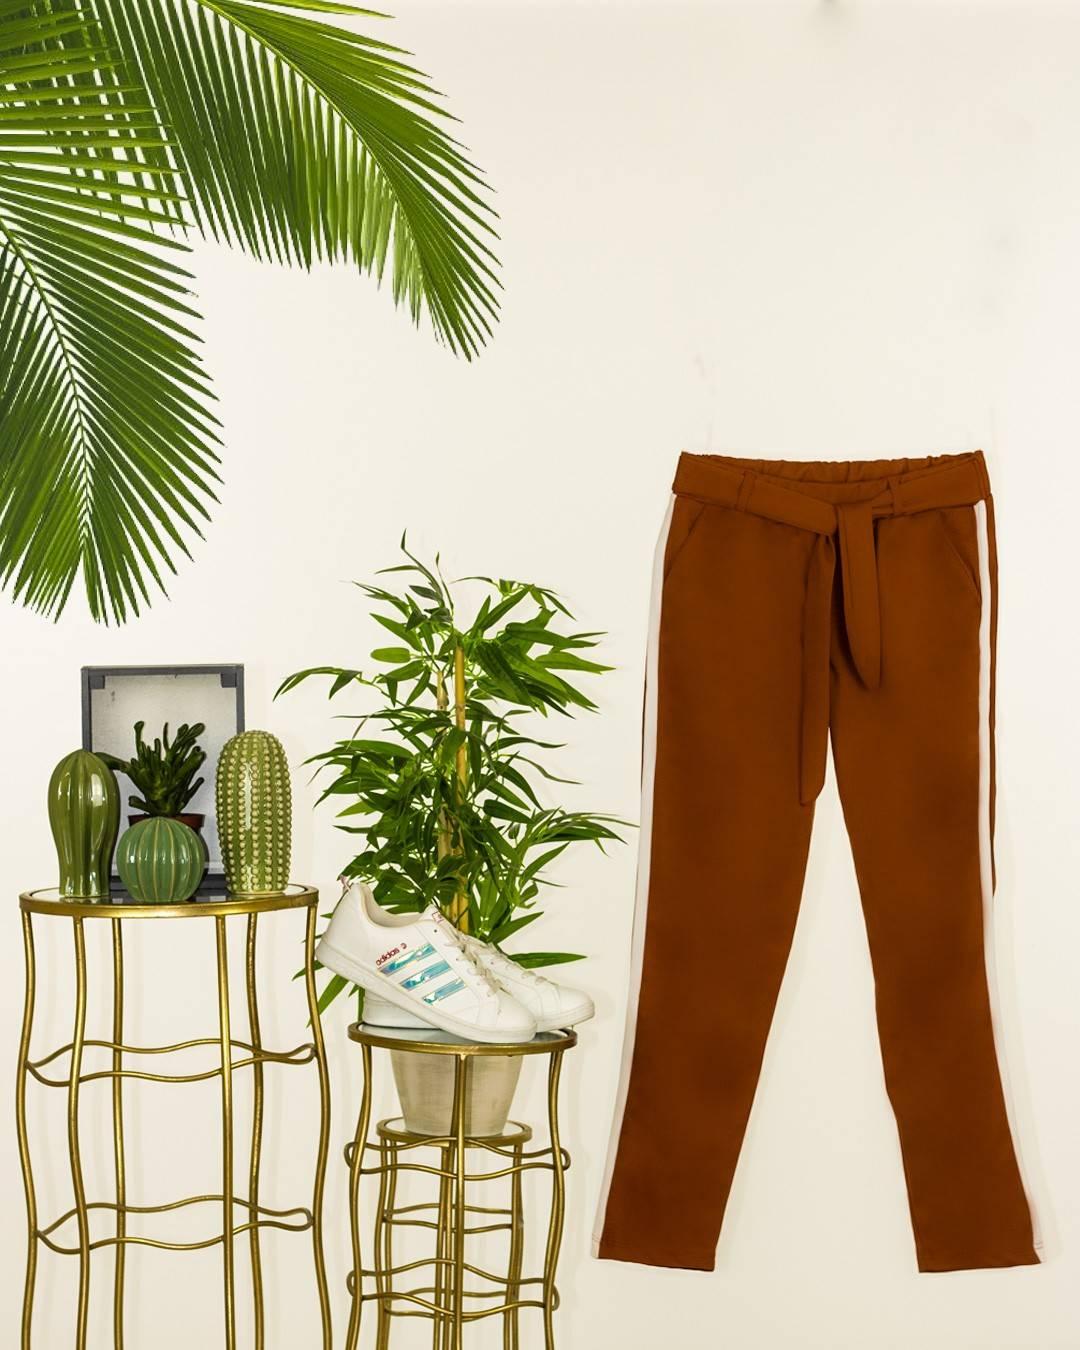 Şeritli cepli yeni sezon pantalon(kiremit) - 4